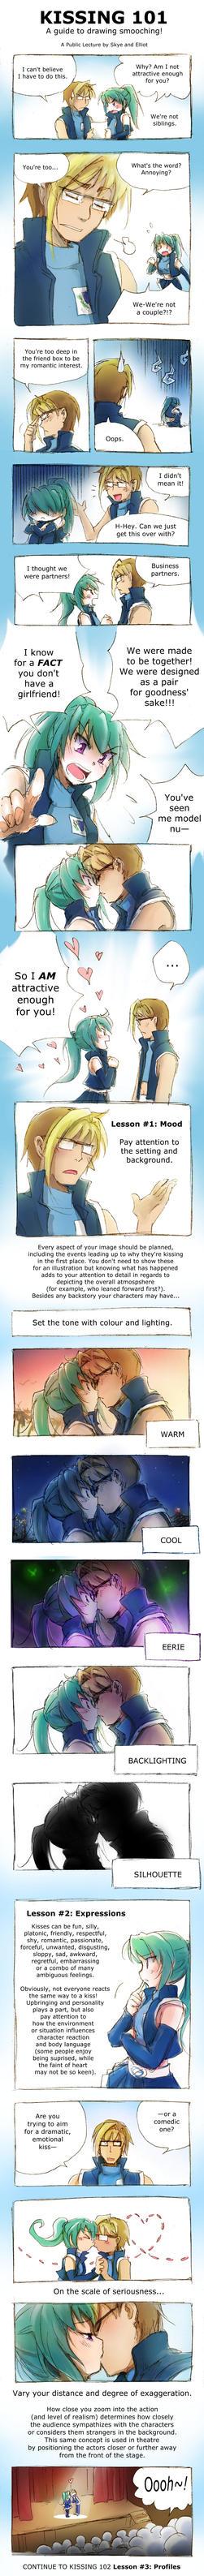 Kissing 101 by Achiru-et-al